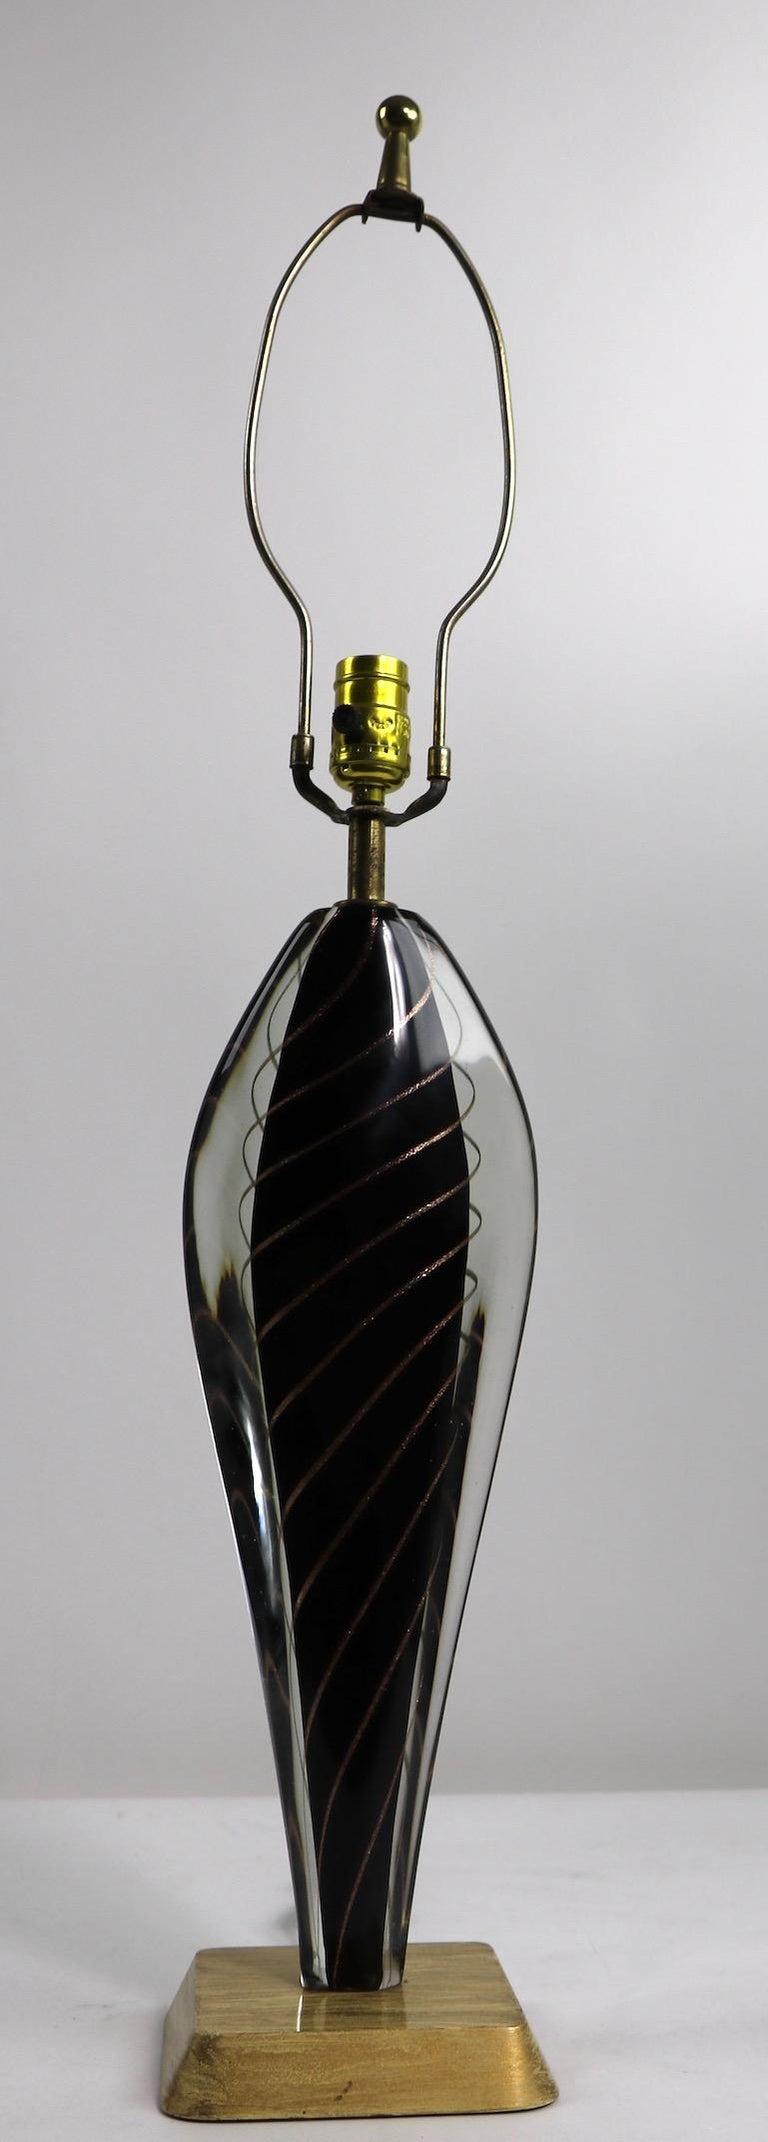 Italian  Murano Lamp by Flavio Poli For Sale